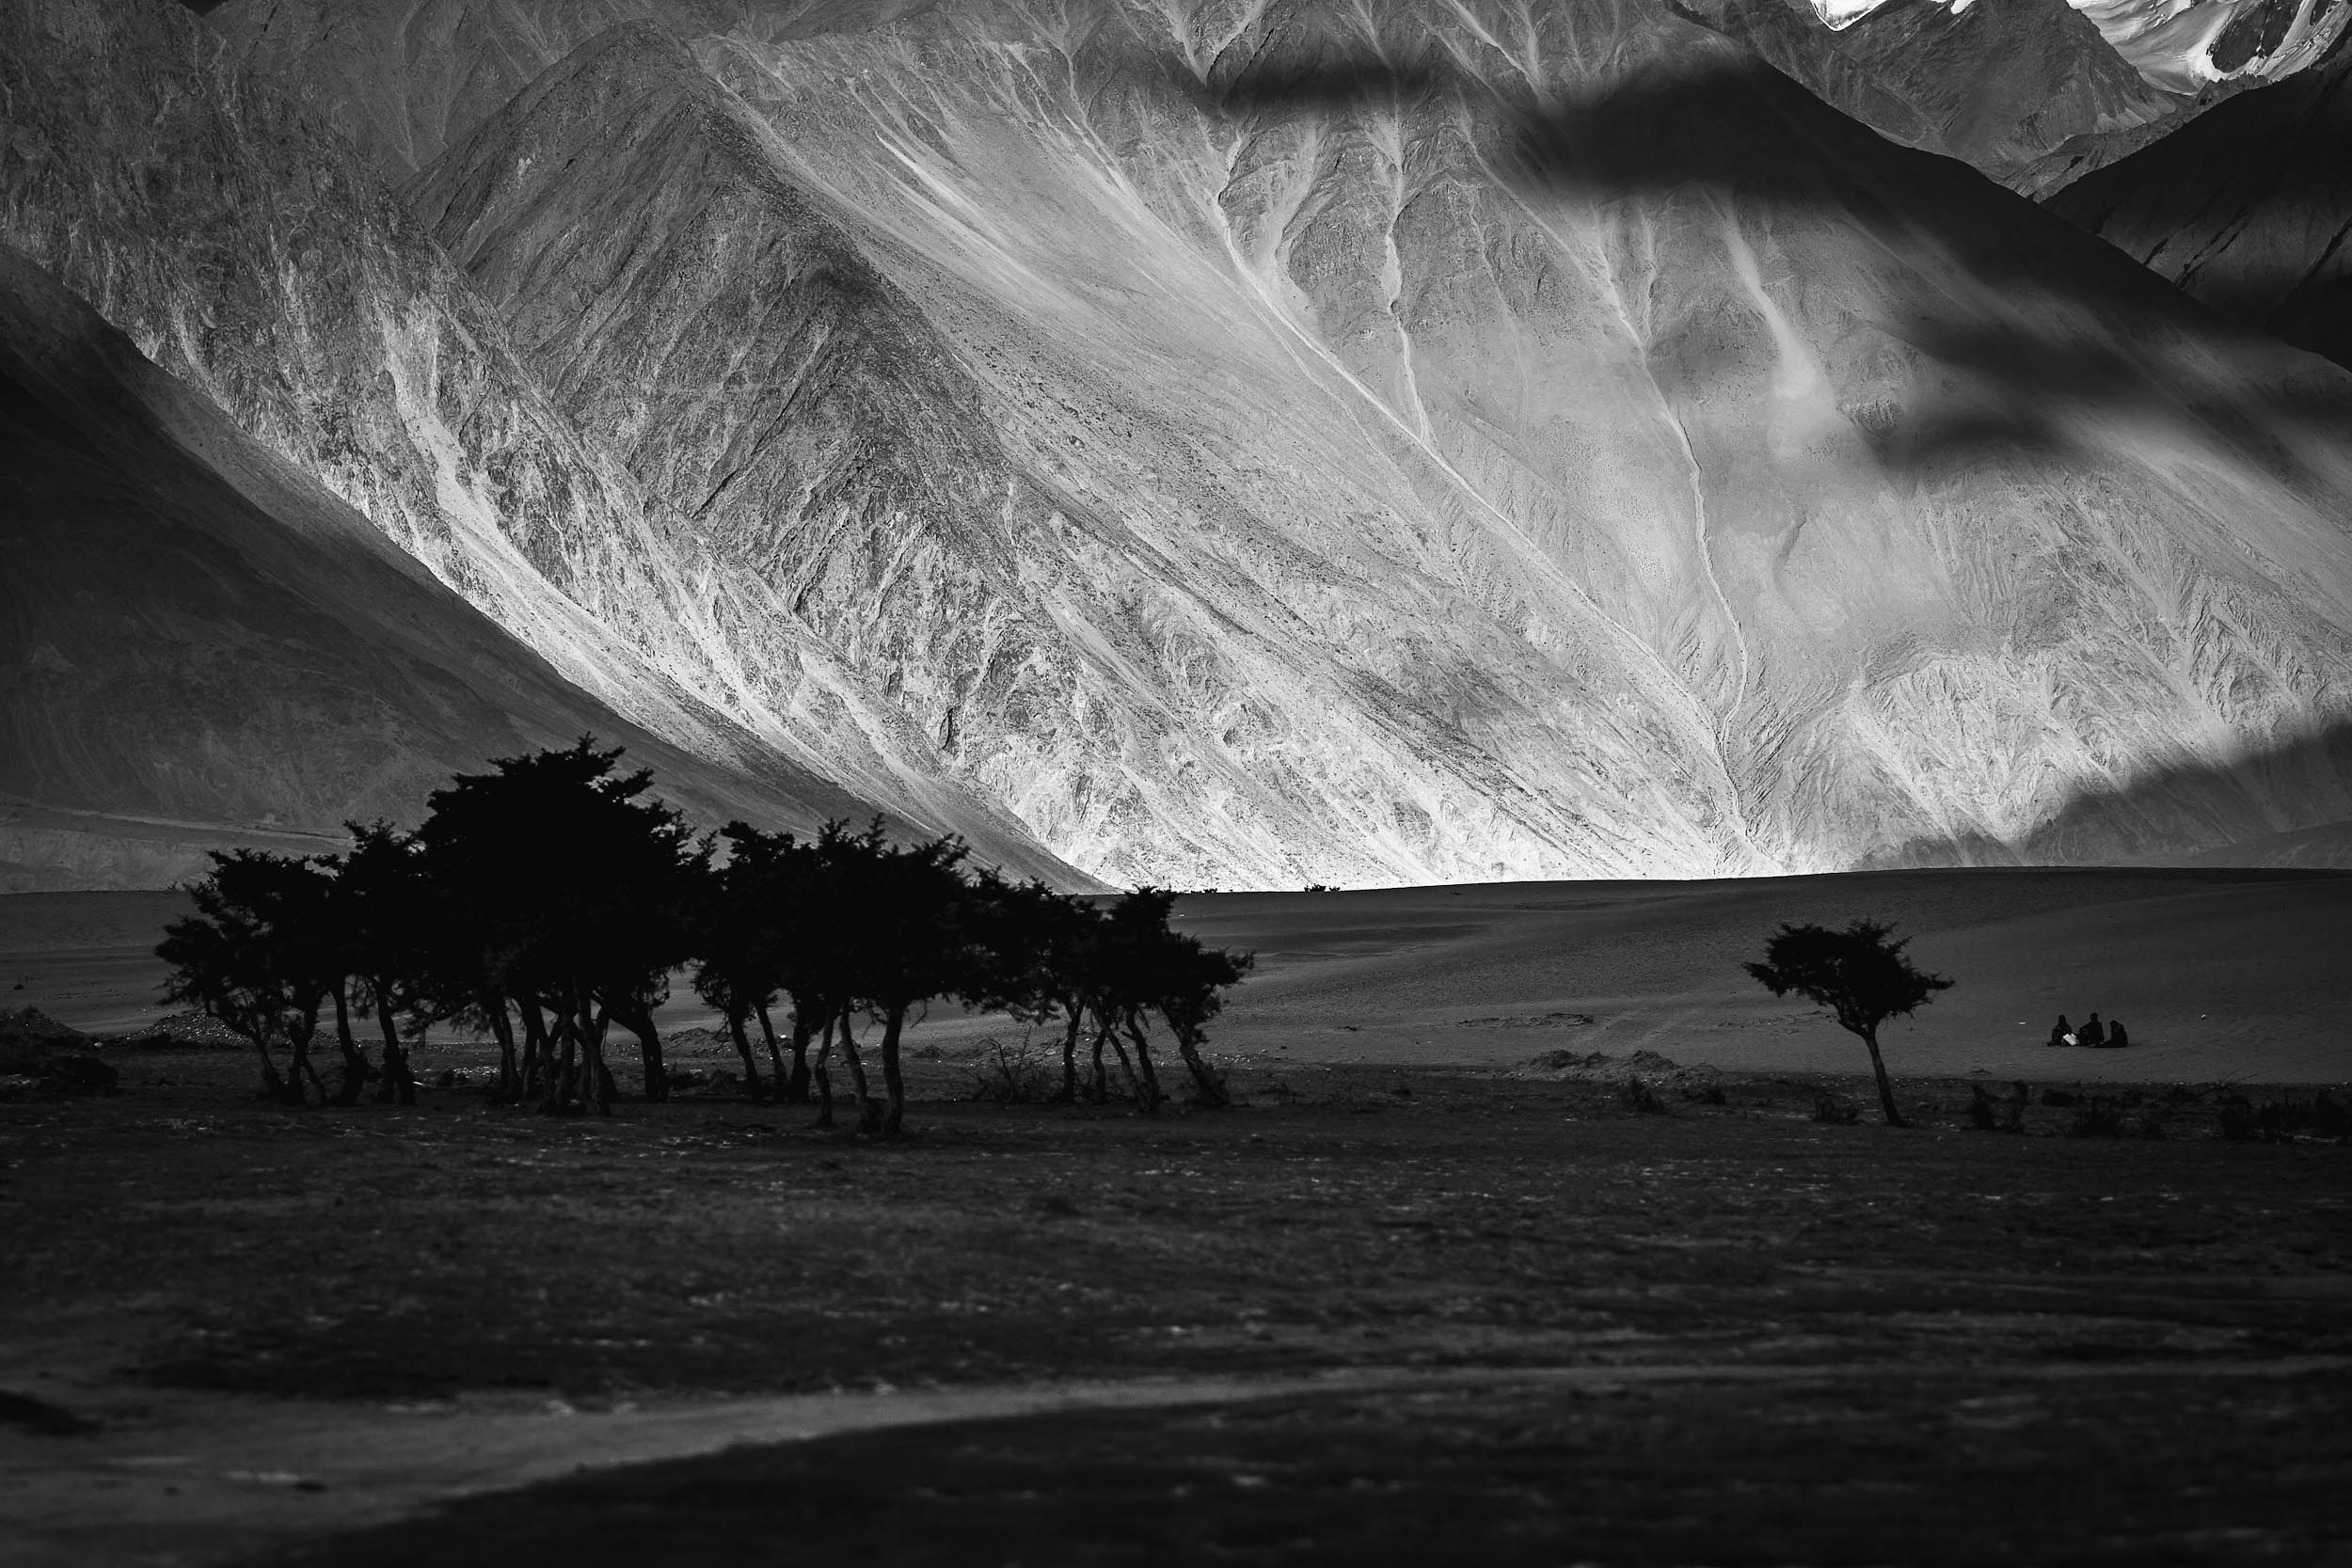 Sindhur_Photography_Travel_Landscape_Ladakh-28.JPG